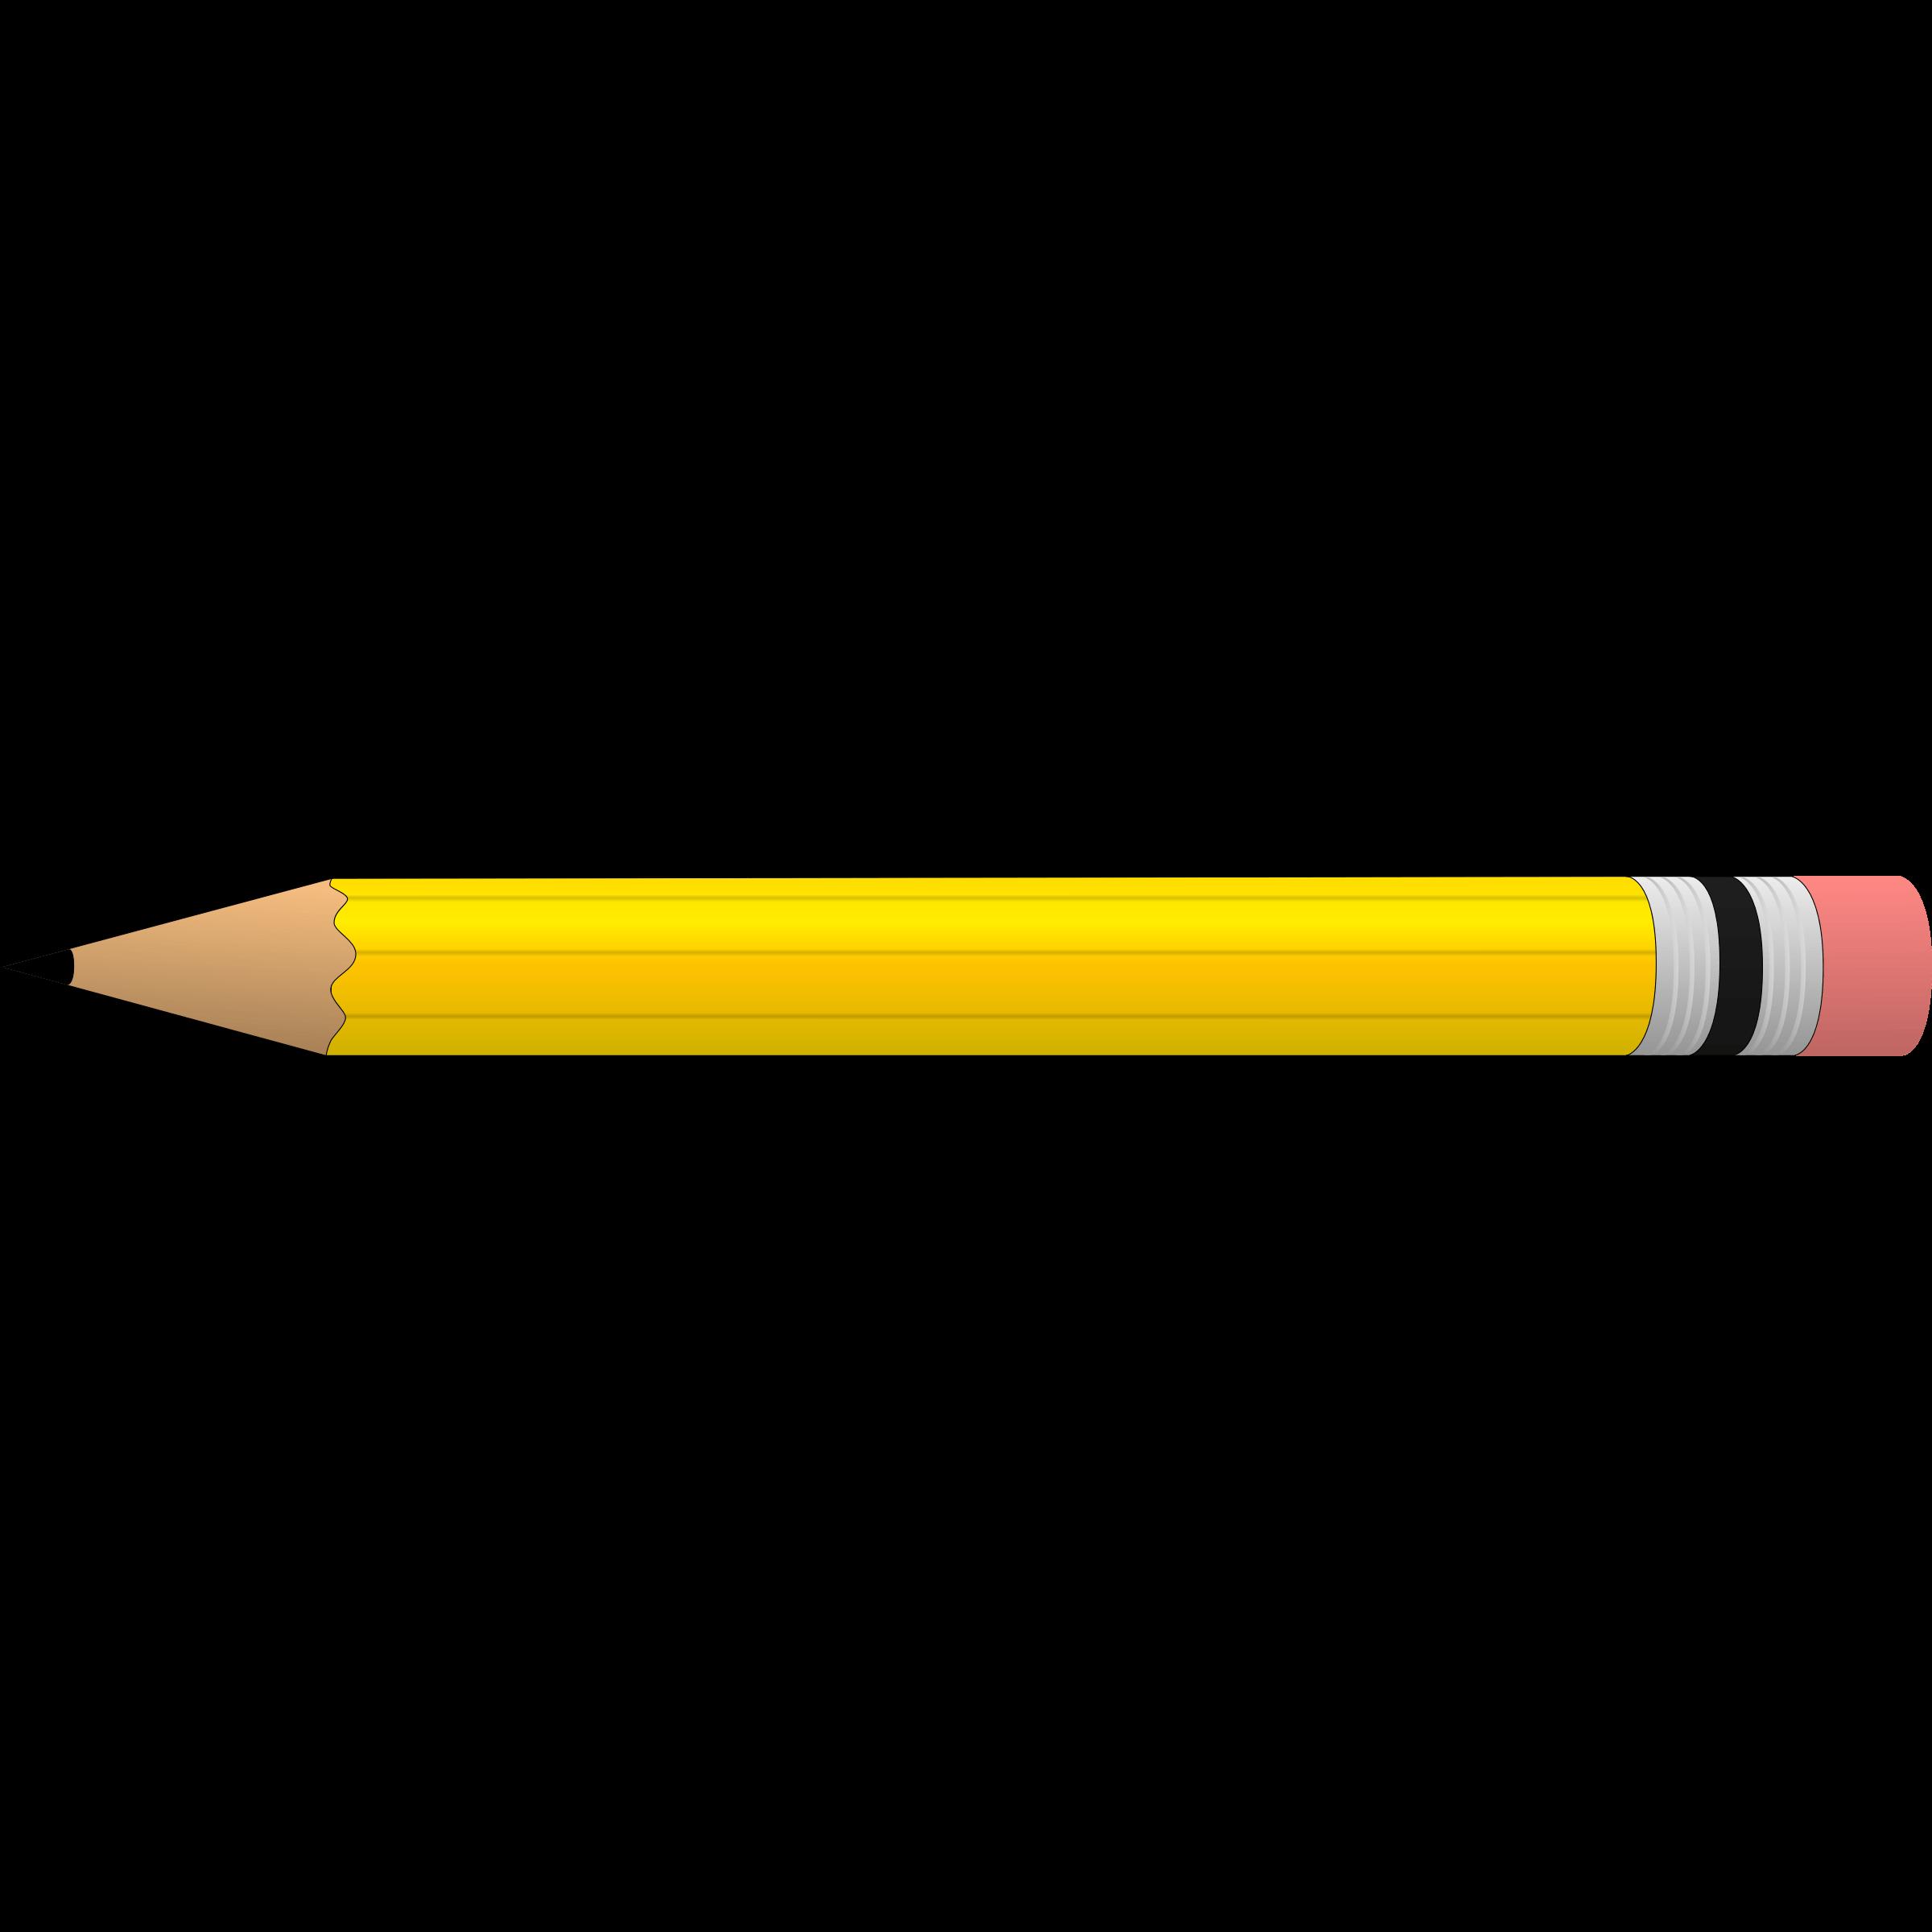 Free Pencil Clipart Transparent, Download Free Clip Art.